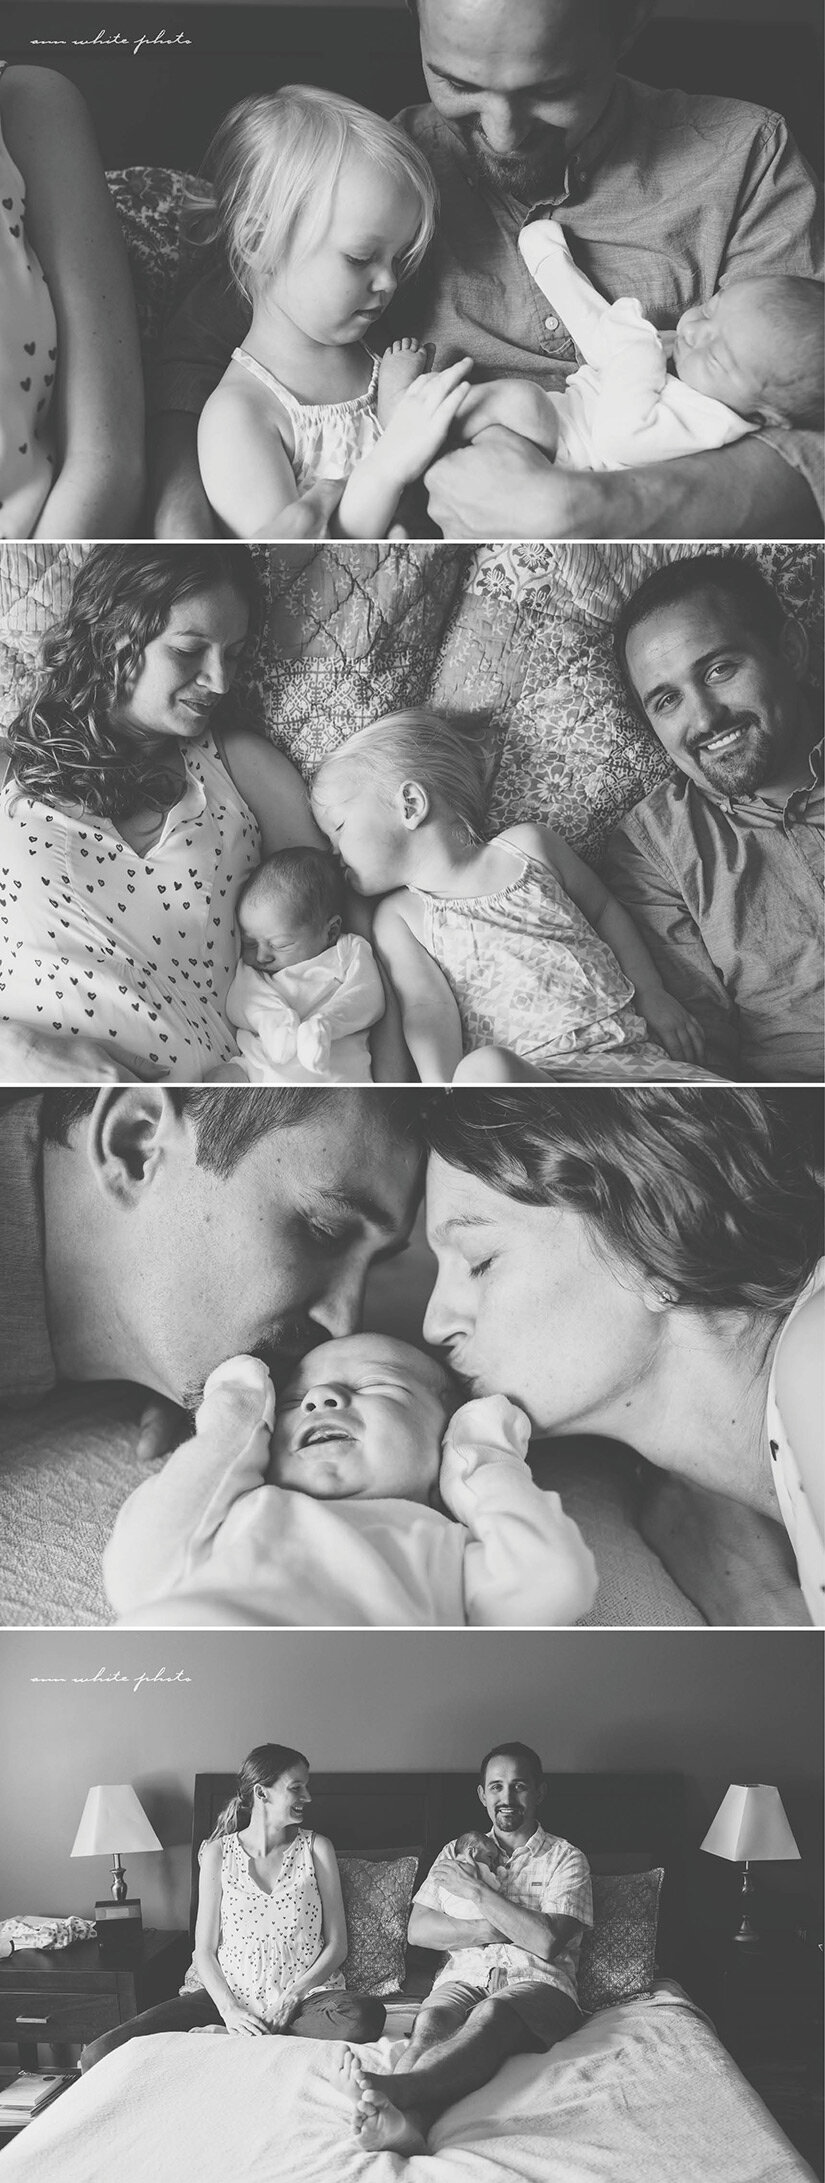 2016_Dyllan_newborn_blog2.jpg